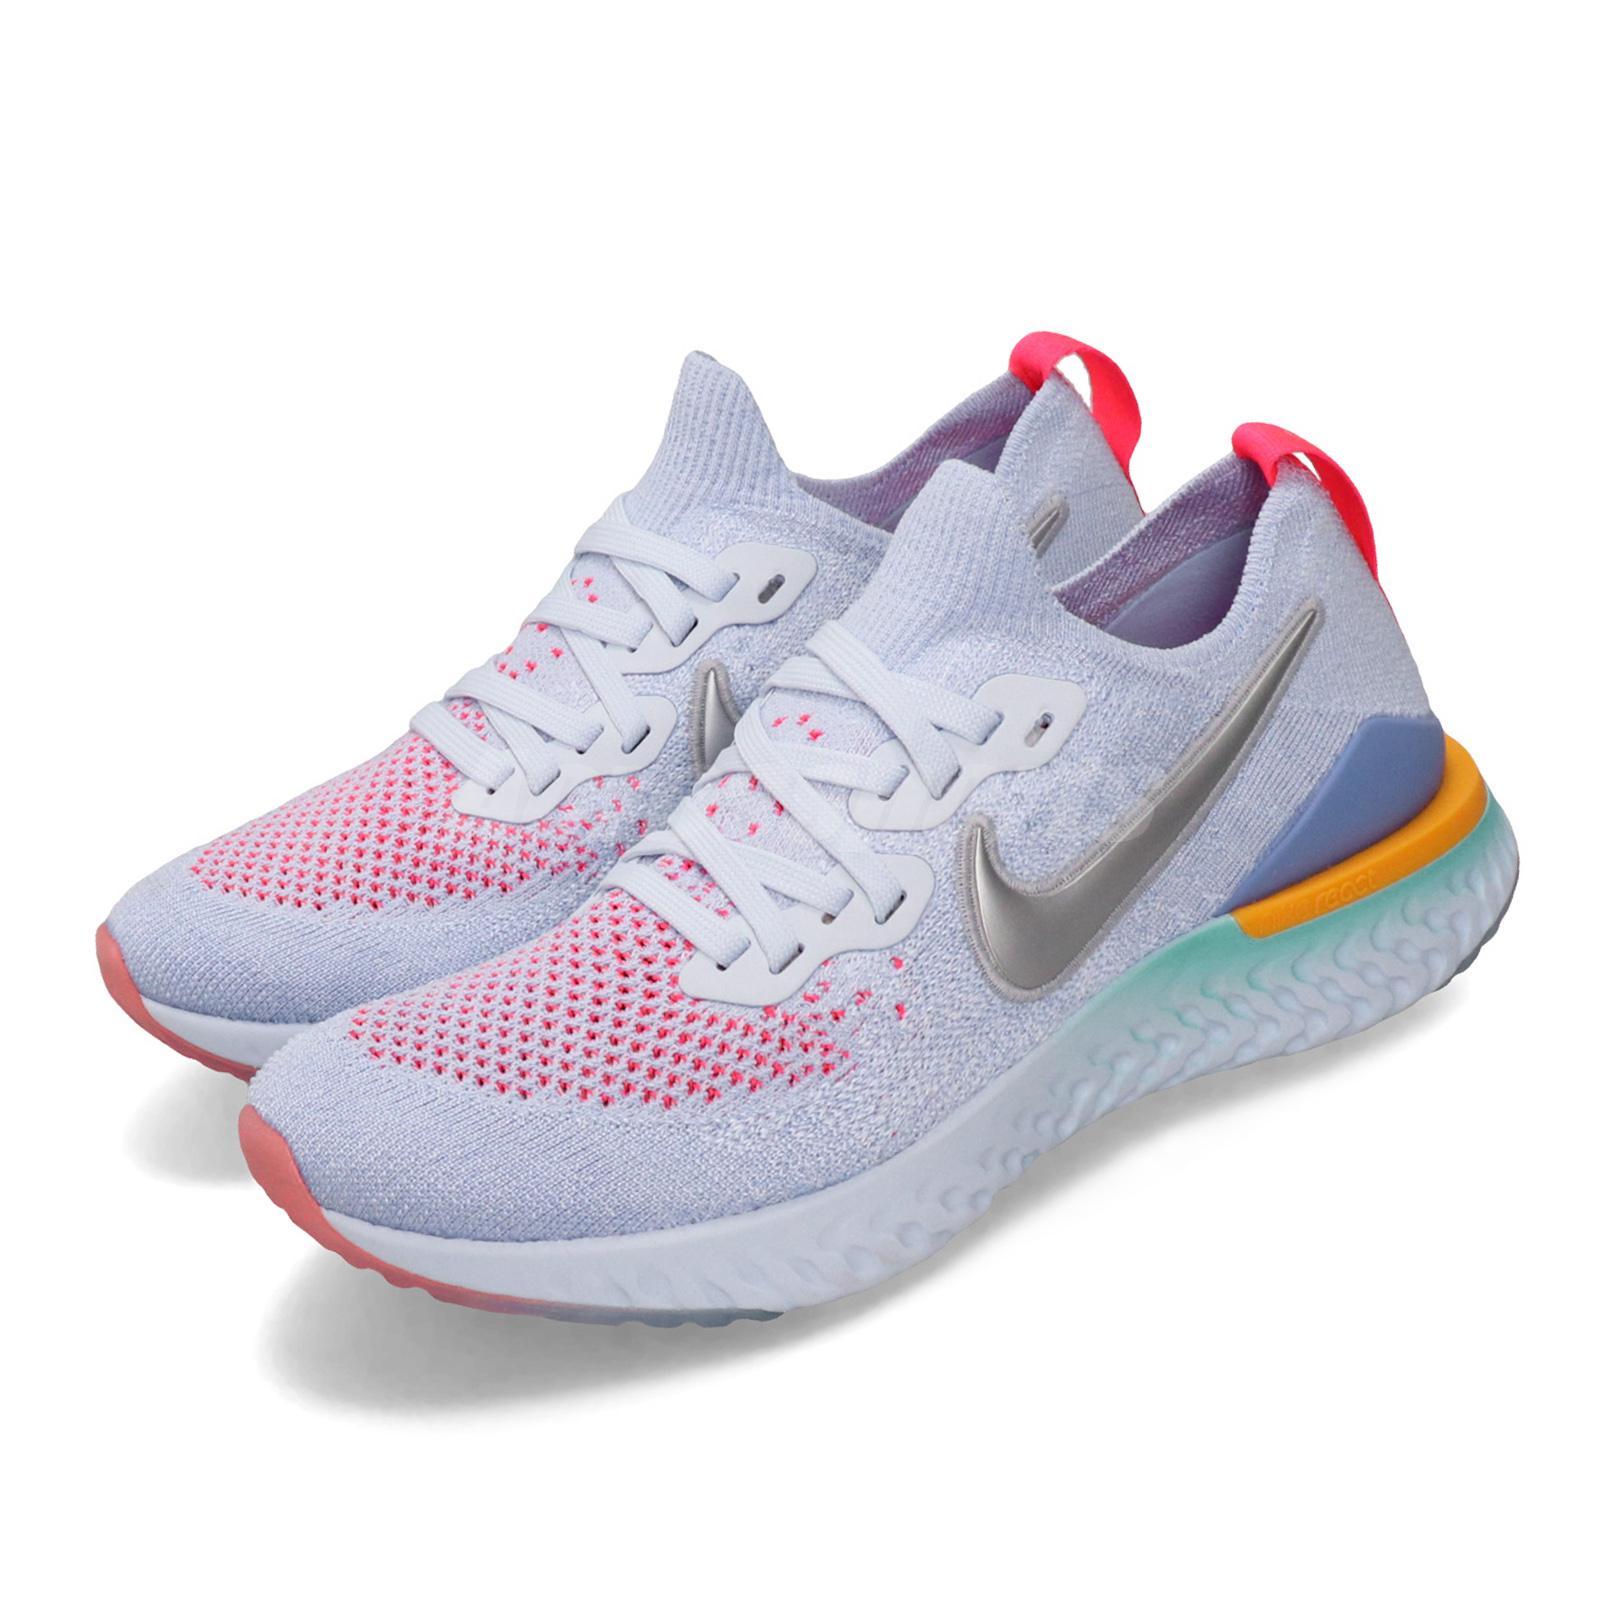 los angeles pretty cheap uk store Nike Epic React Flyknit 2 GS Aluminum Silver Blue Pink Kid Women ...